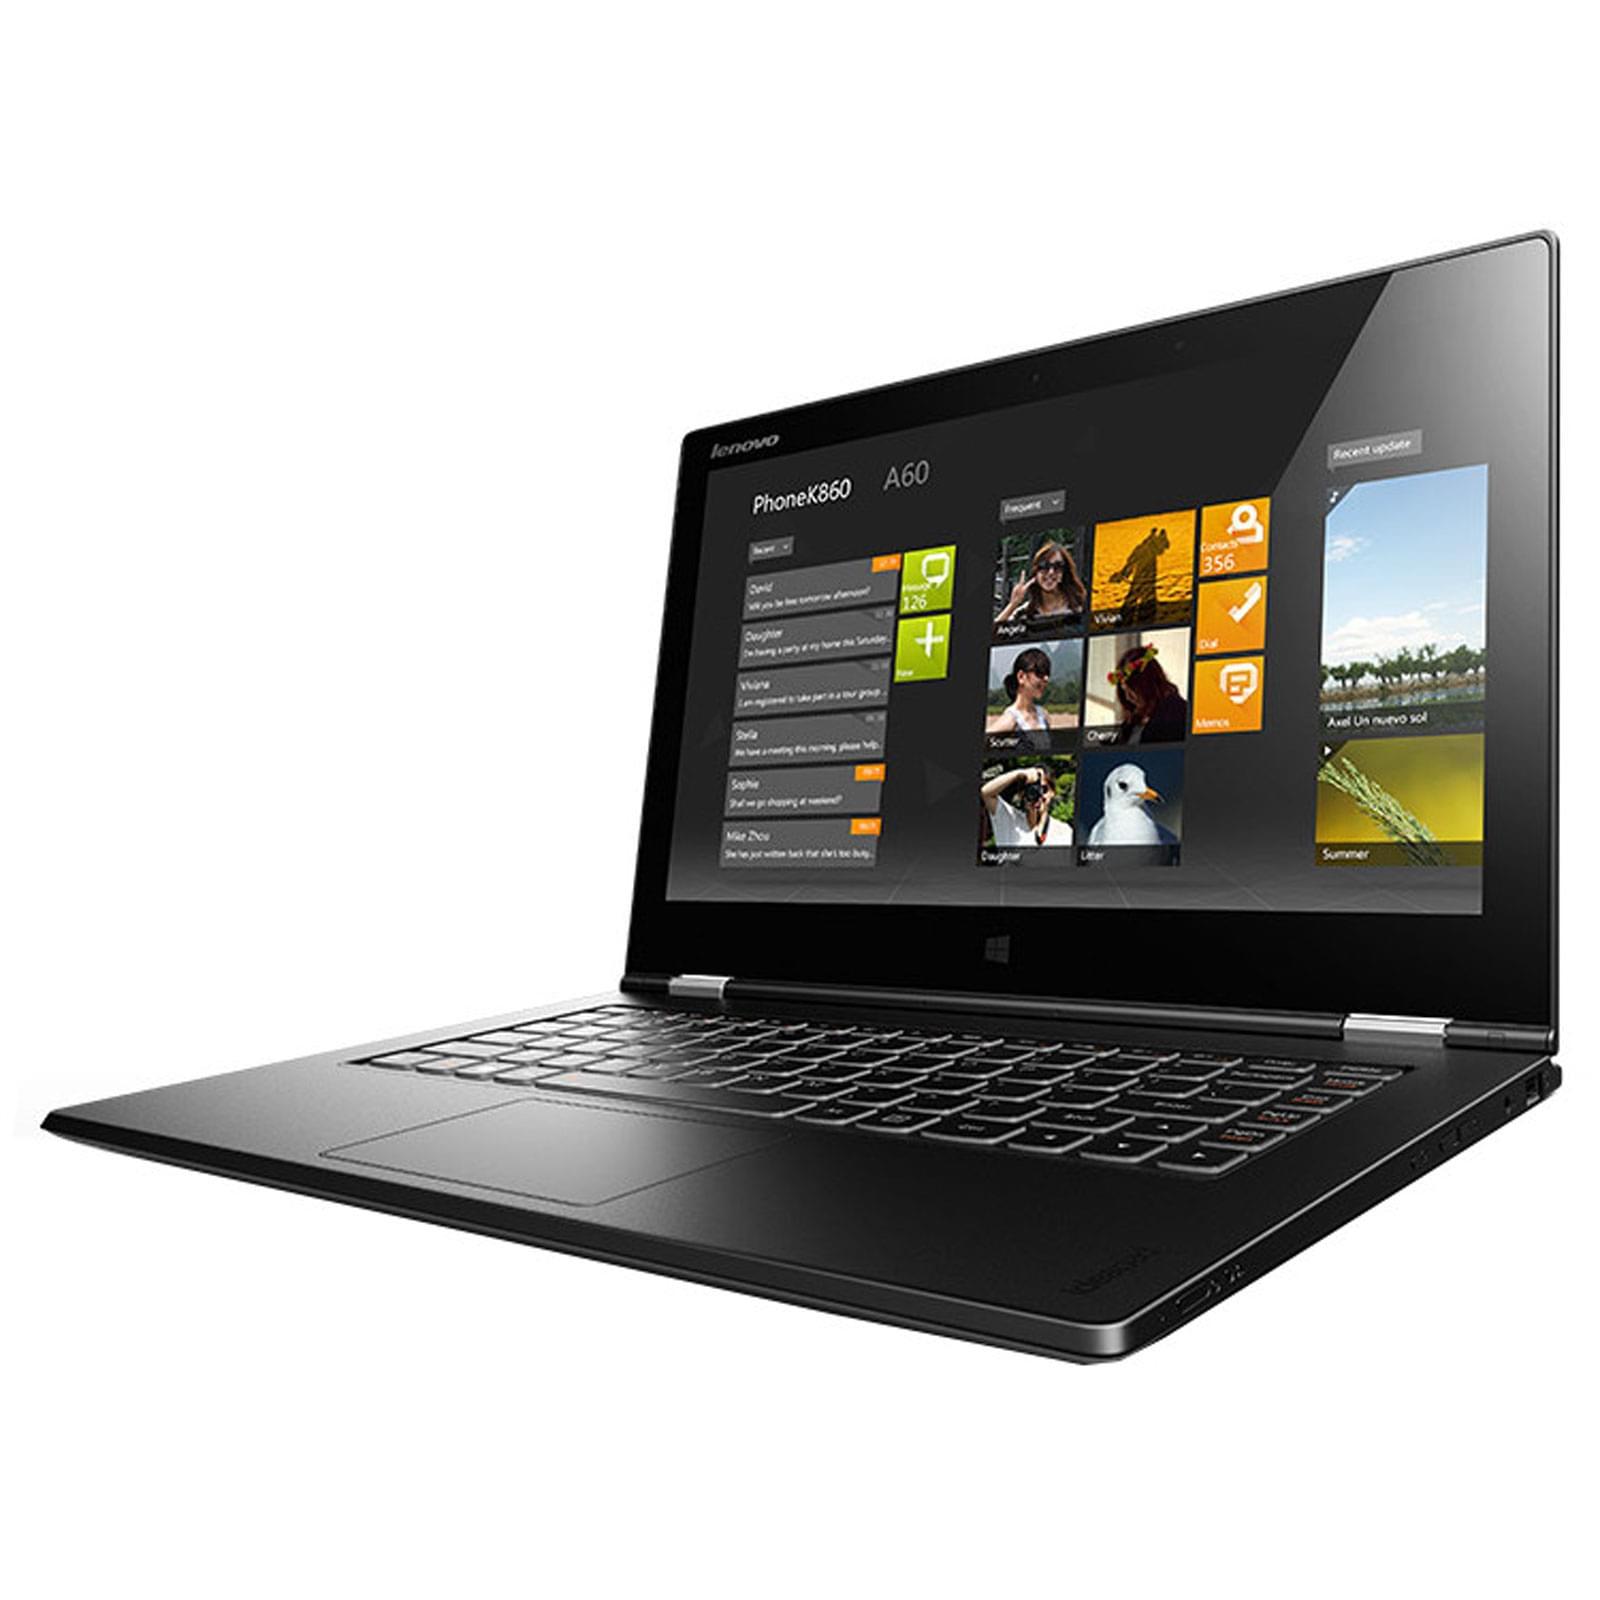 Lenovo Yoga 2 Pro (59420702) - Achat / Vente PC Portable sur Cybertek.fr - 0